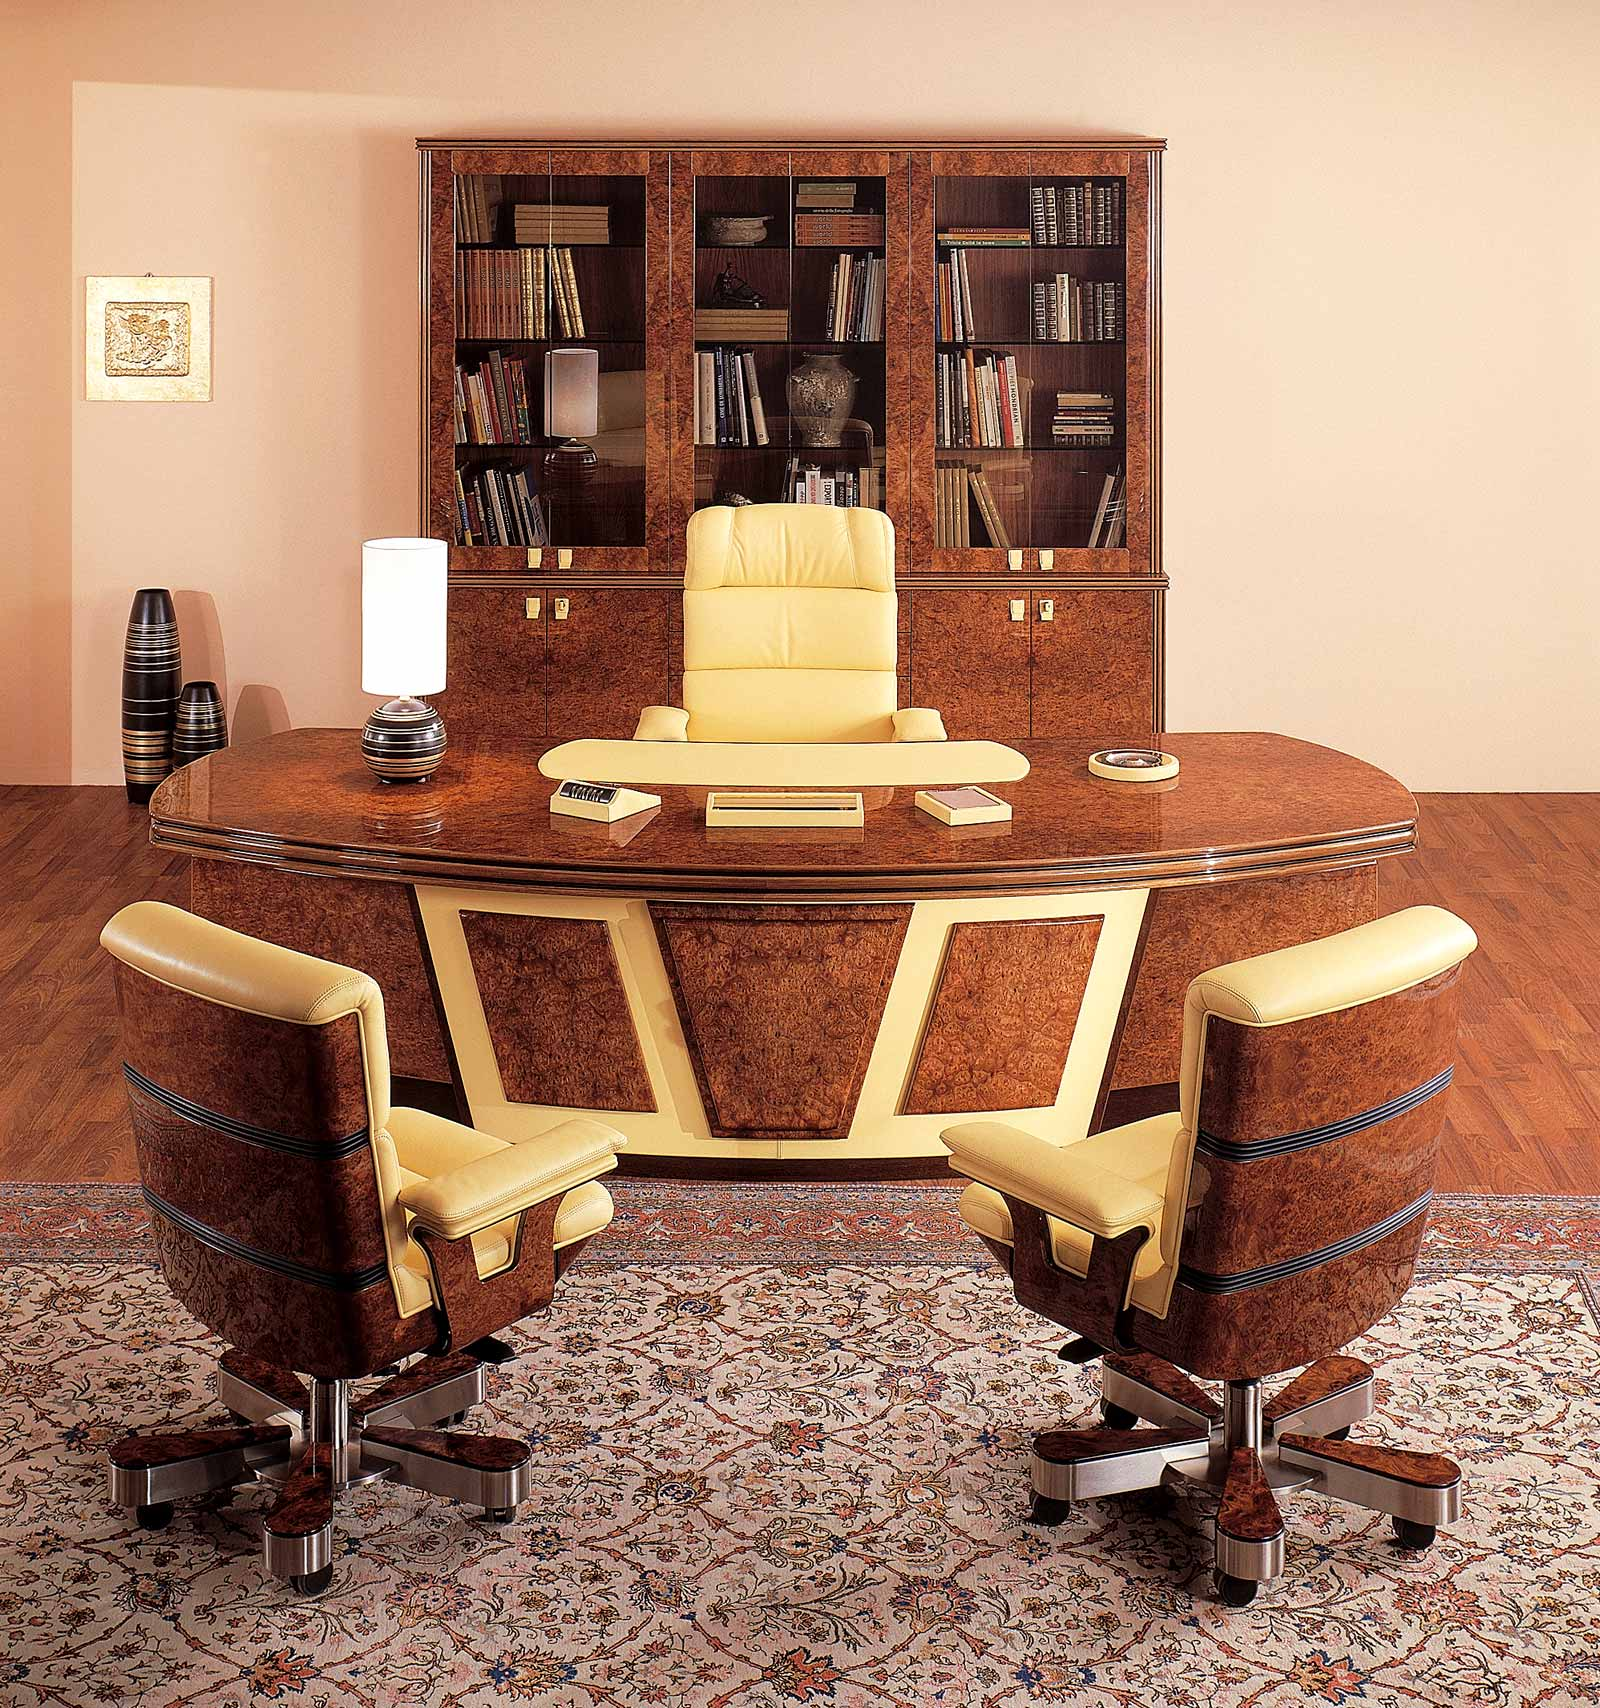 Uffici dirigenziali e presidenziali di lusso r a mobili for Mobili mobili